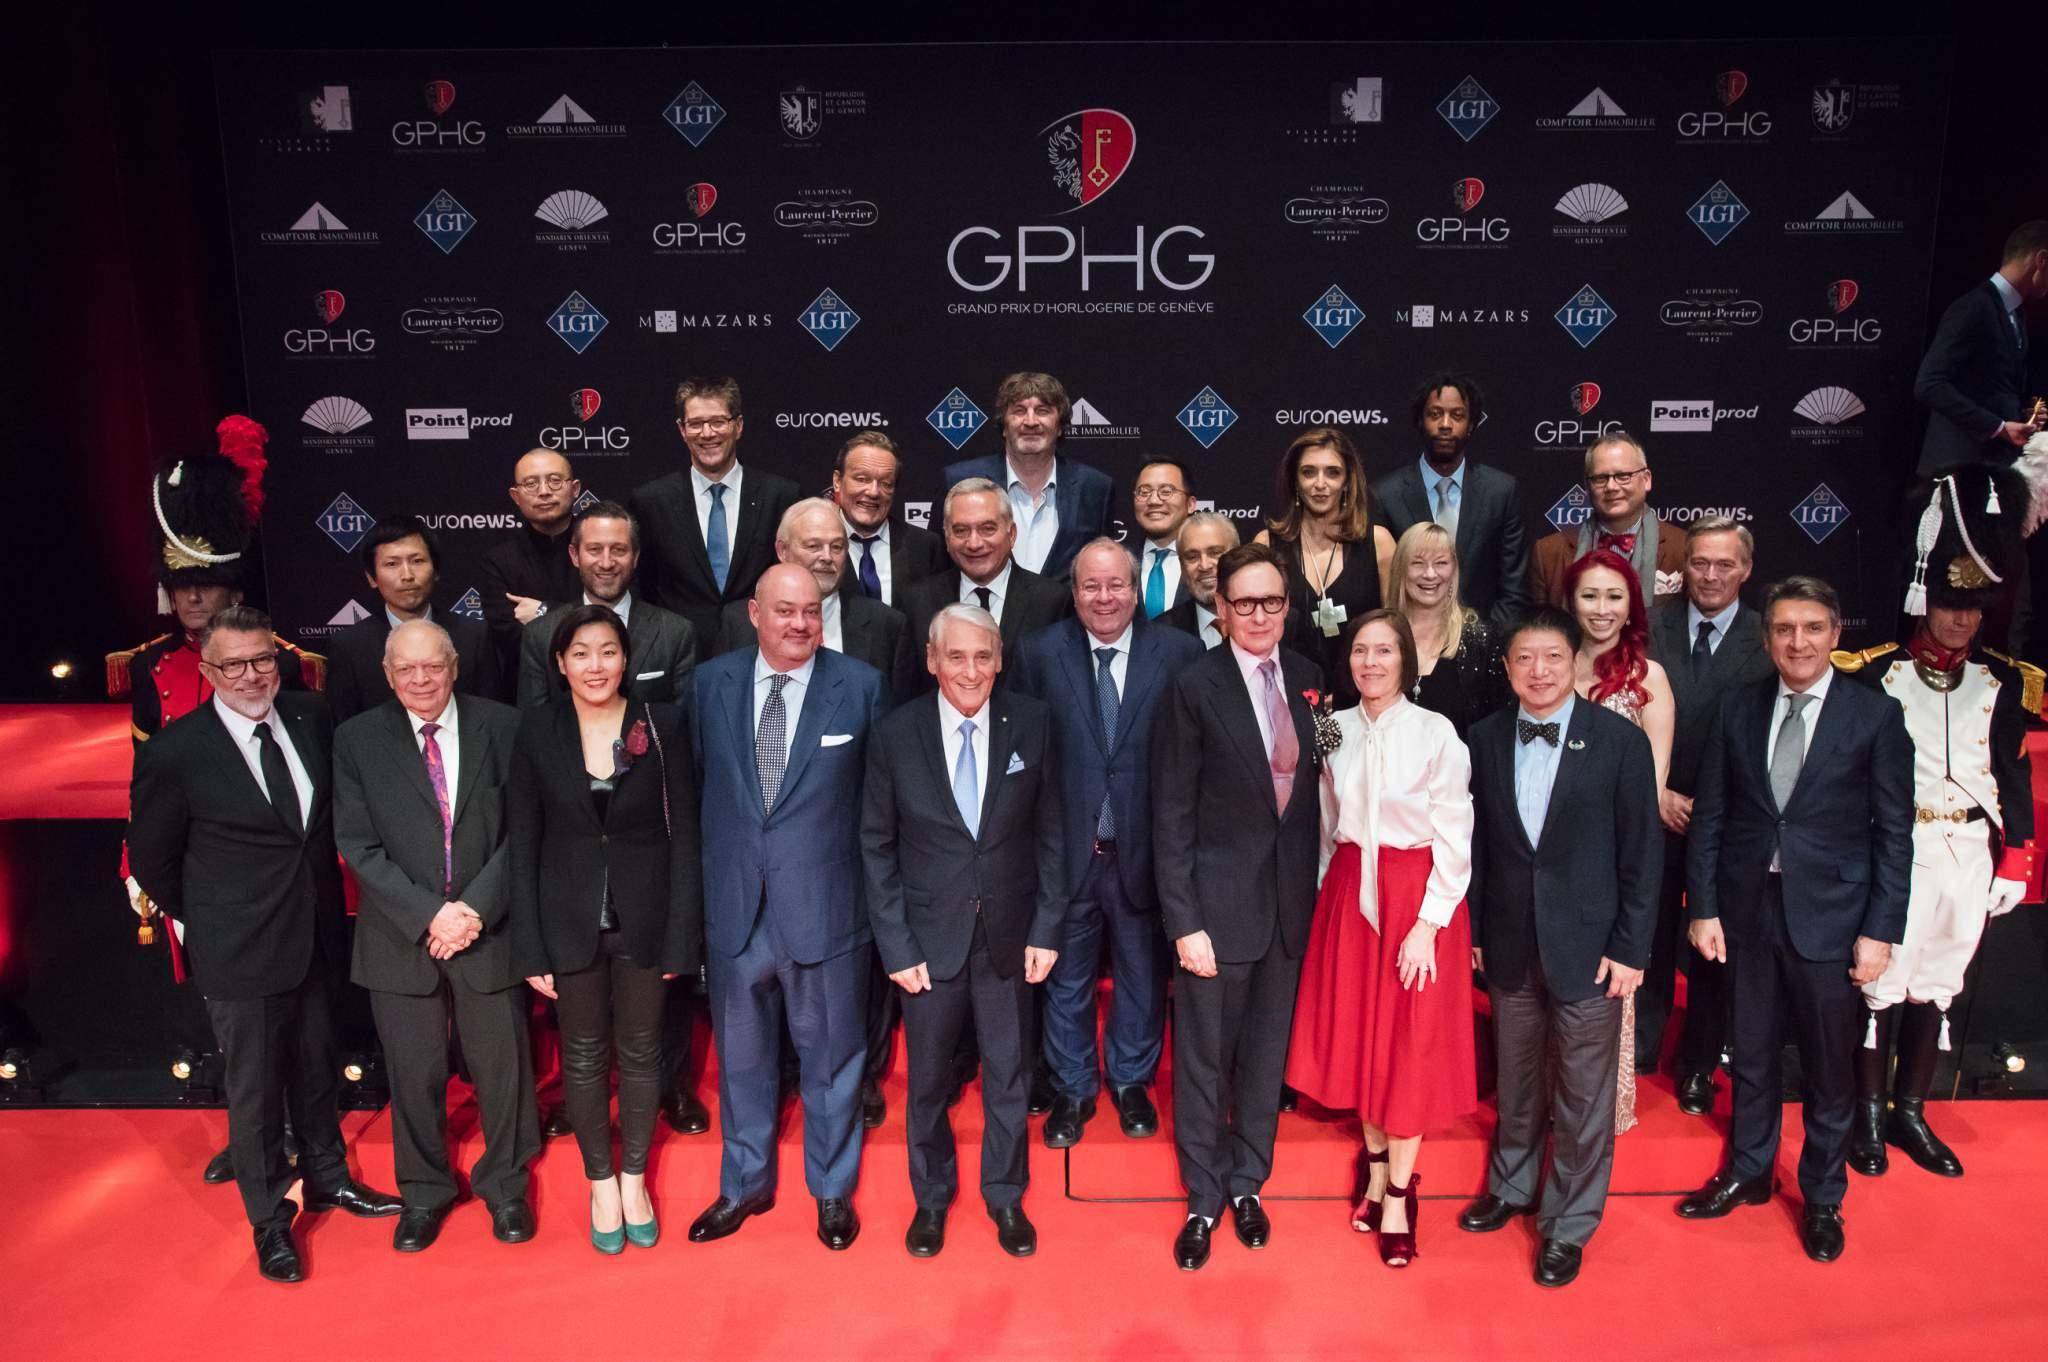 Jury members of the GPHG 17 with Carlo Lamprecht (President of the GPHG Foundation)